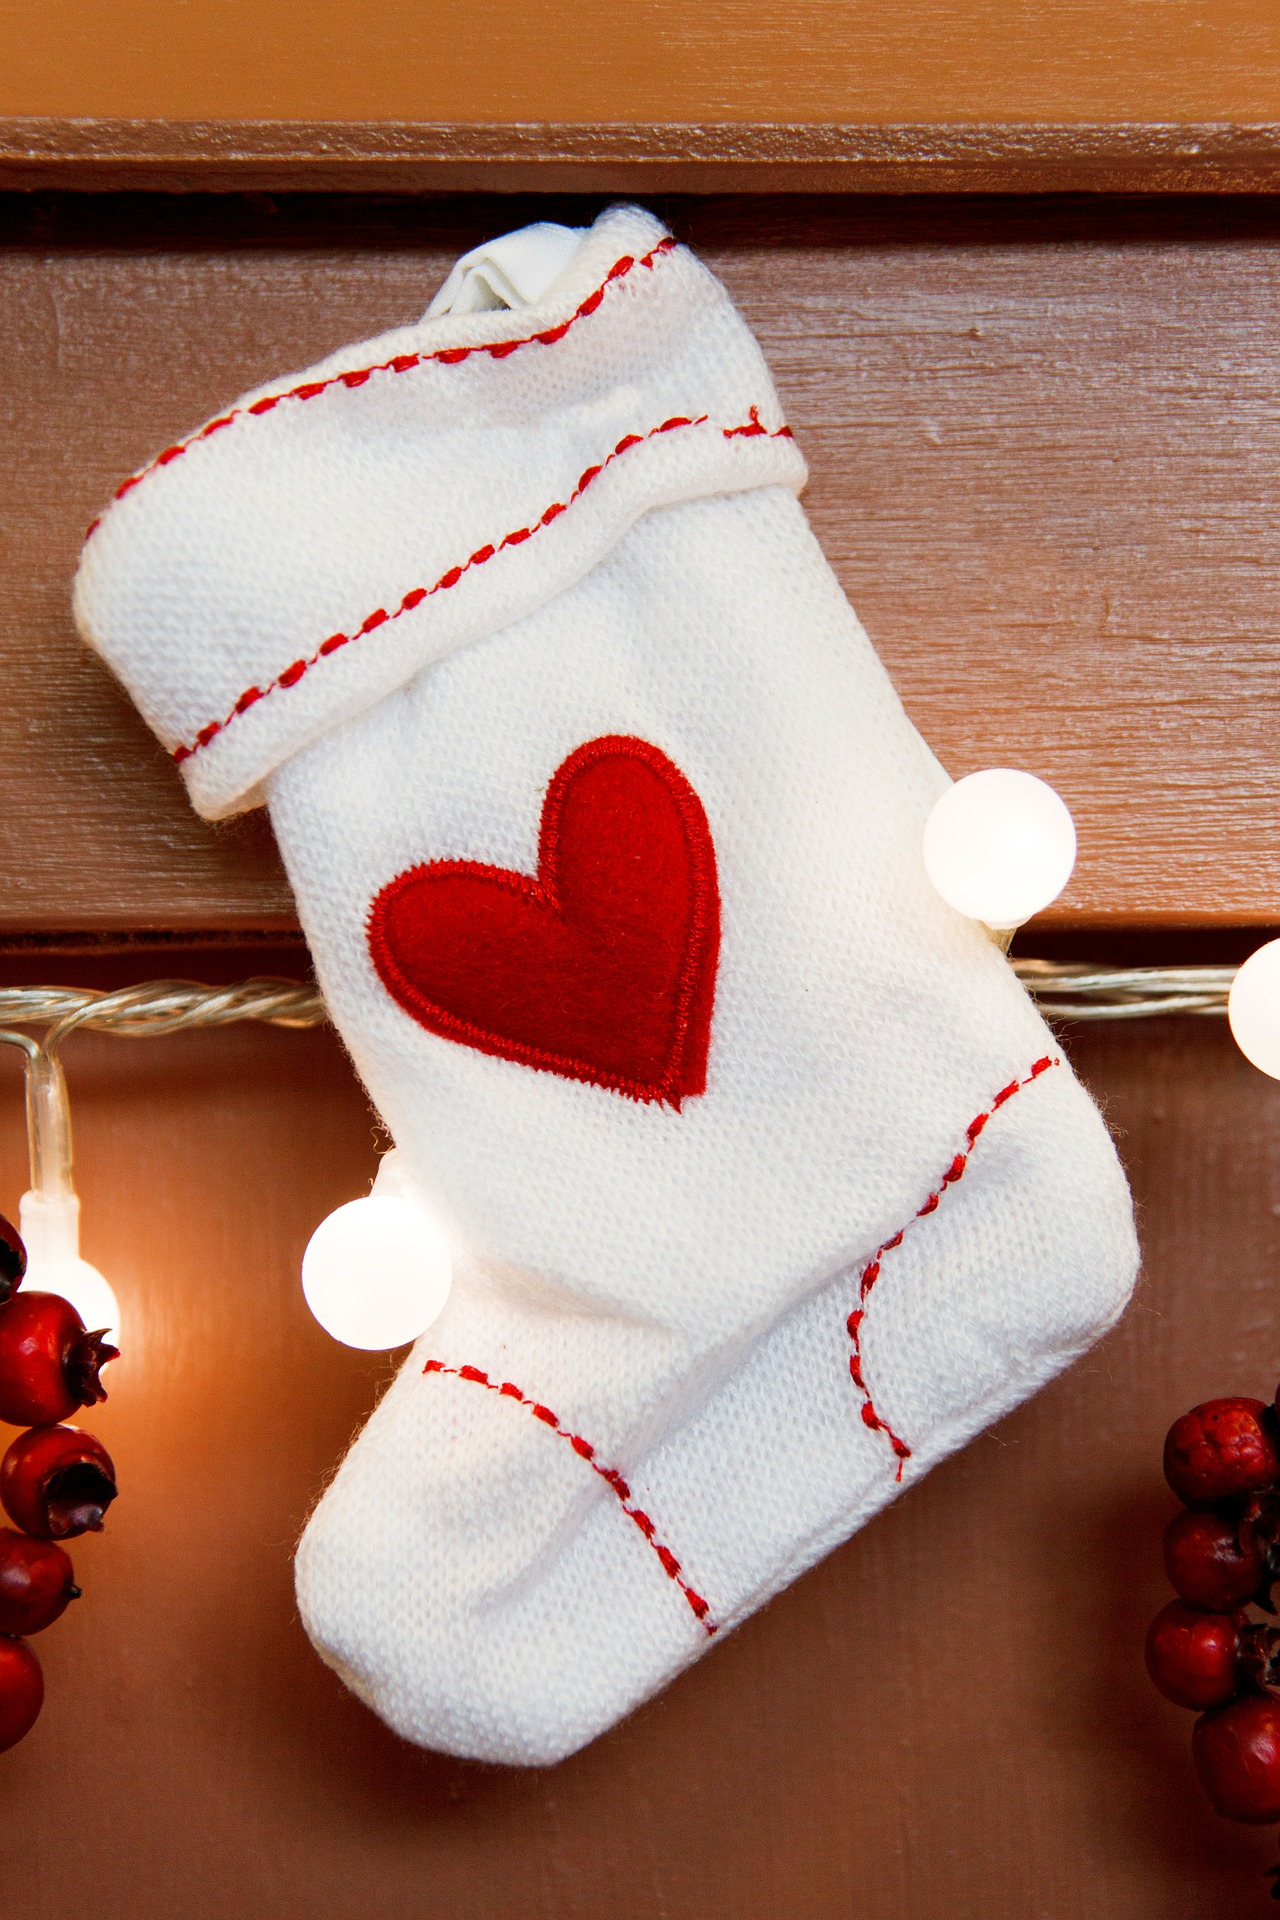 Christmas Stockings | PublicDomainImages pixabay.com